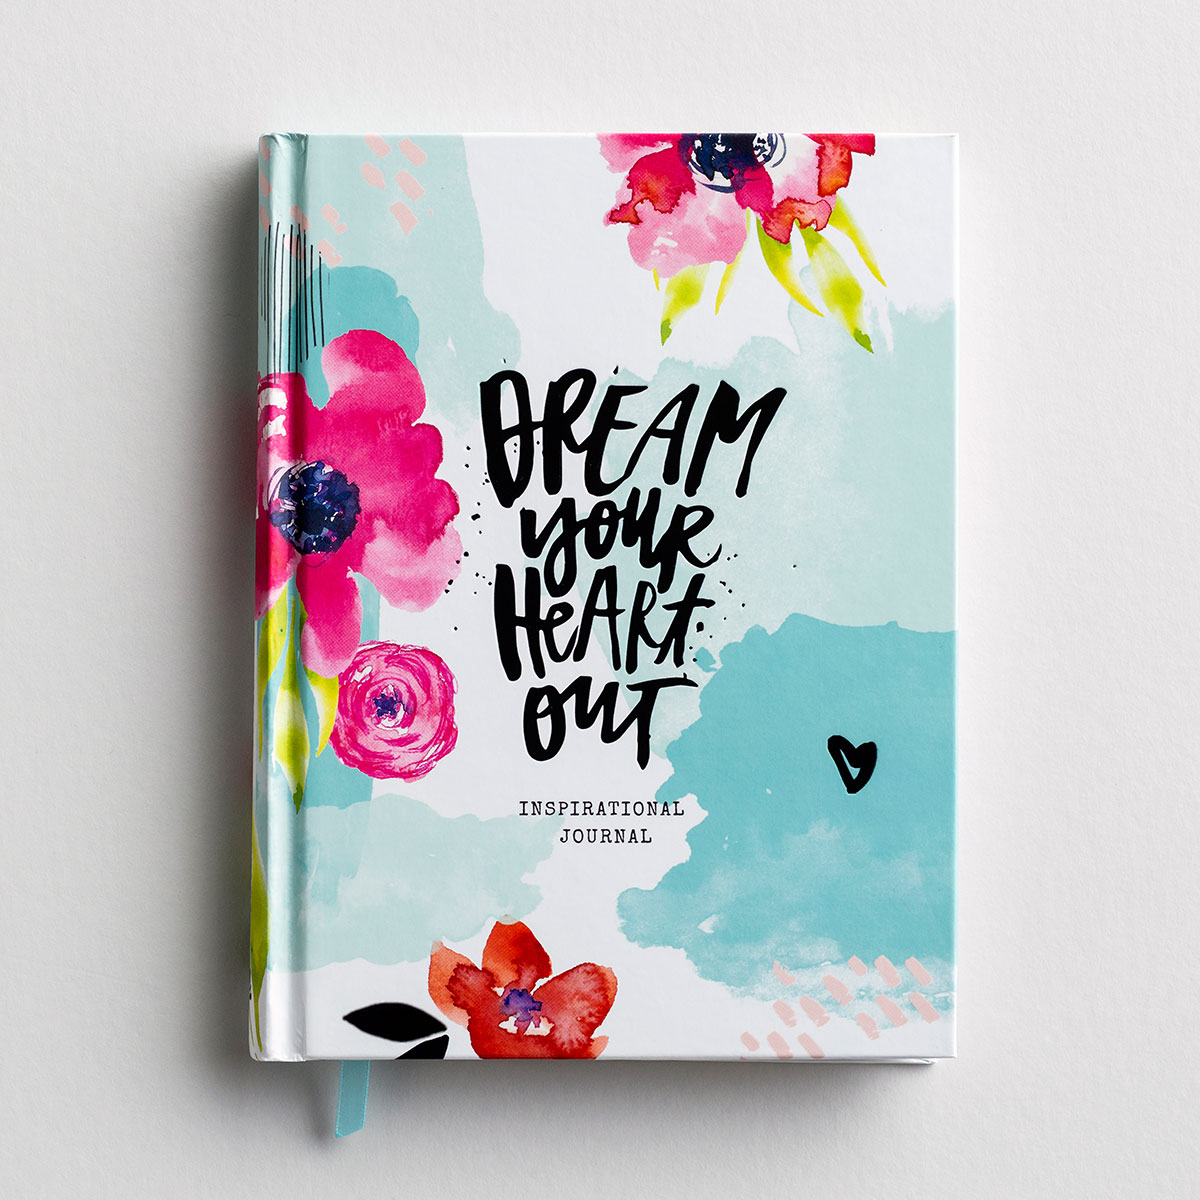 Katygirl - Dream Your Heart Out - Christian Journal